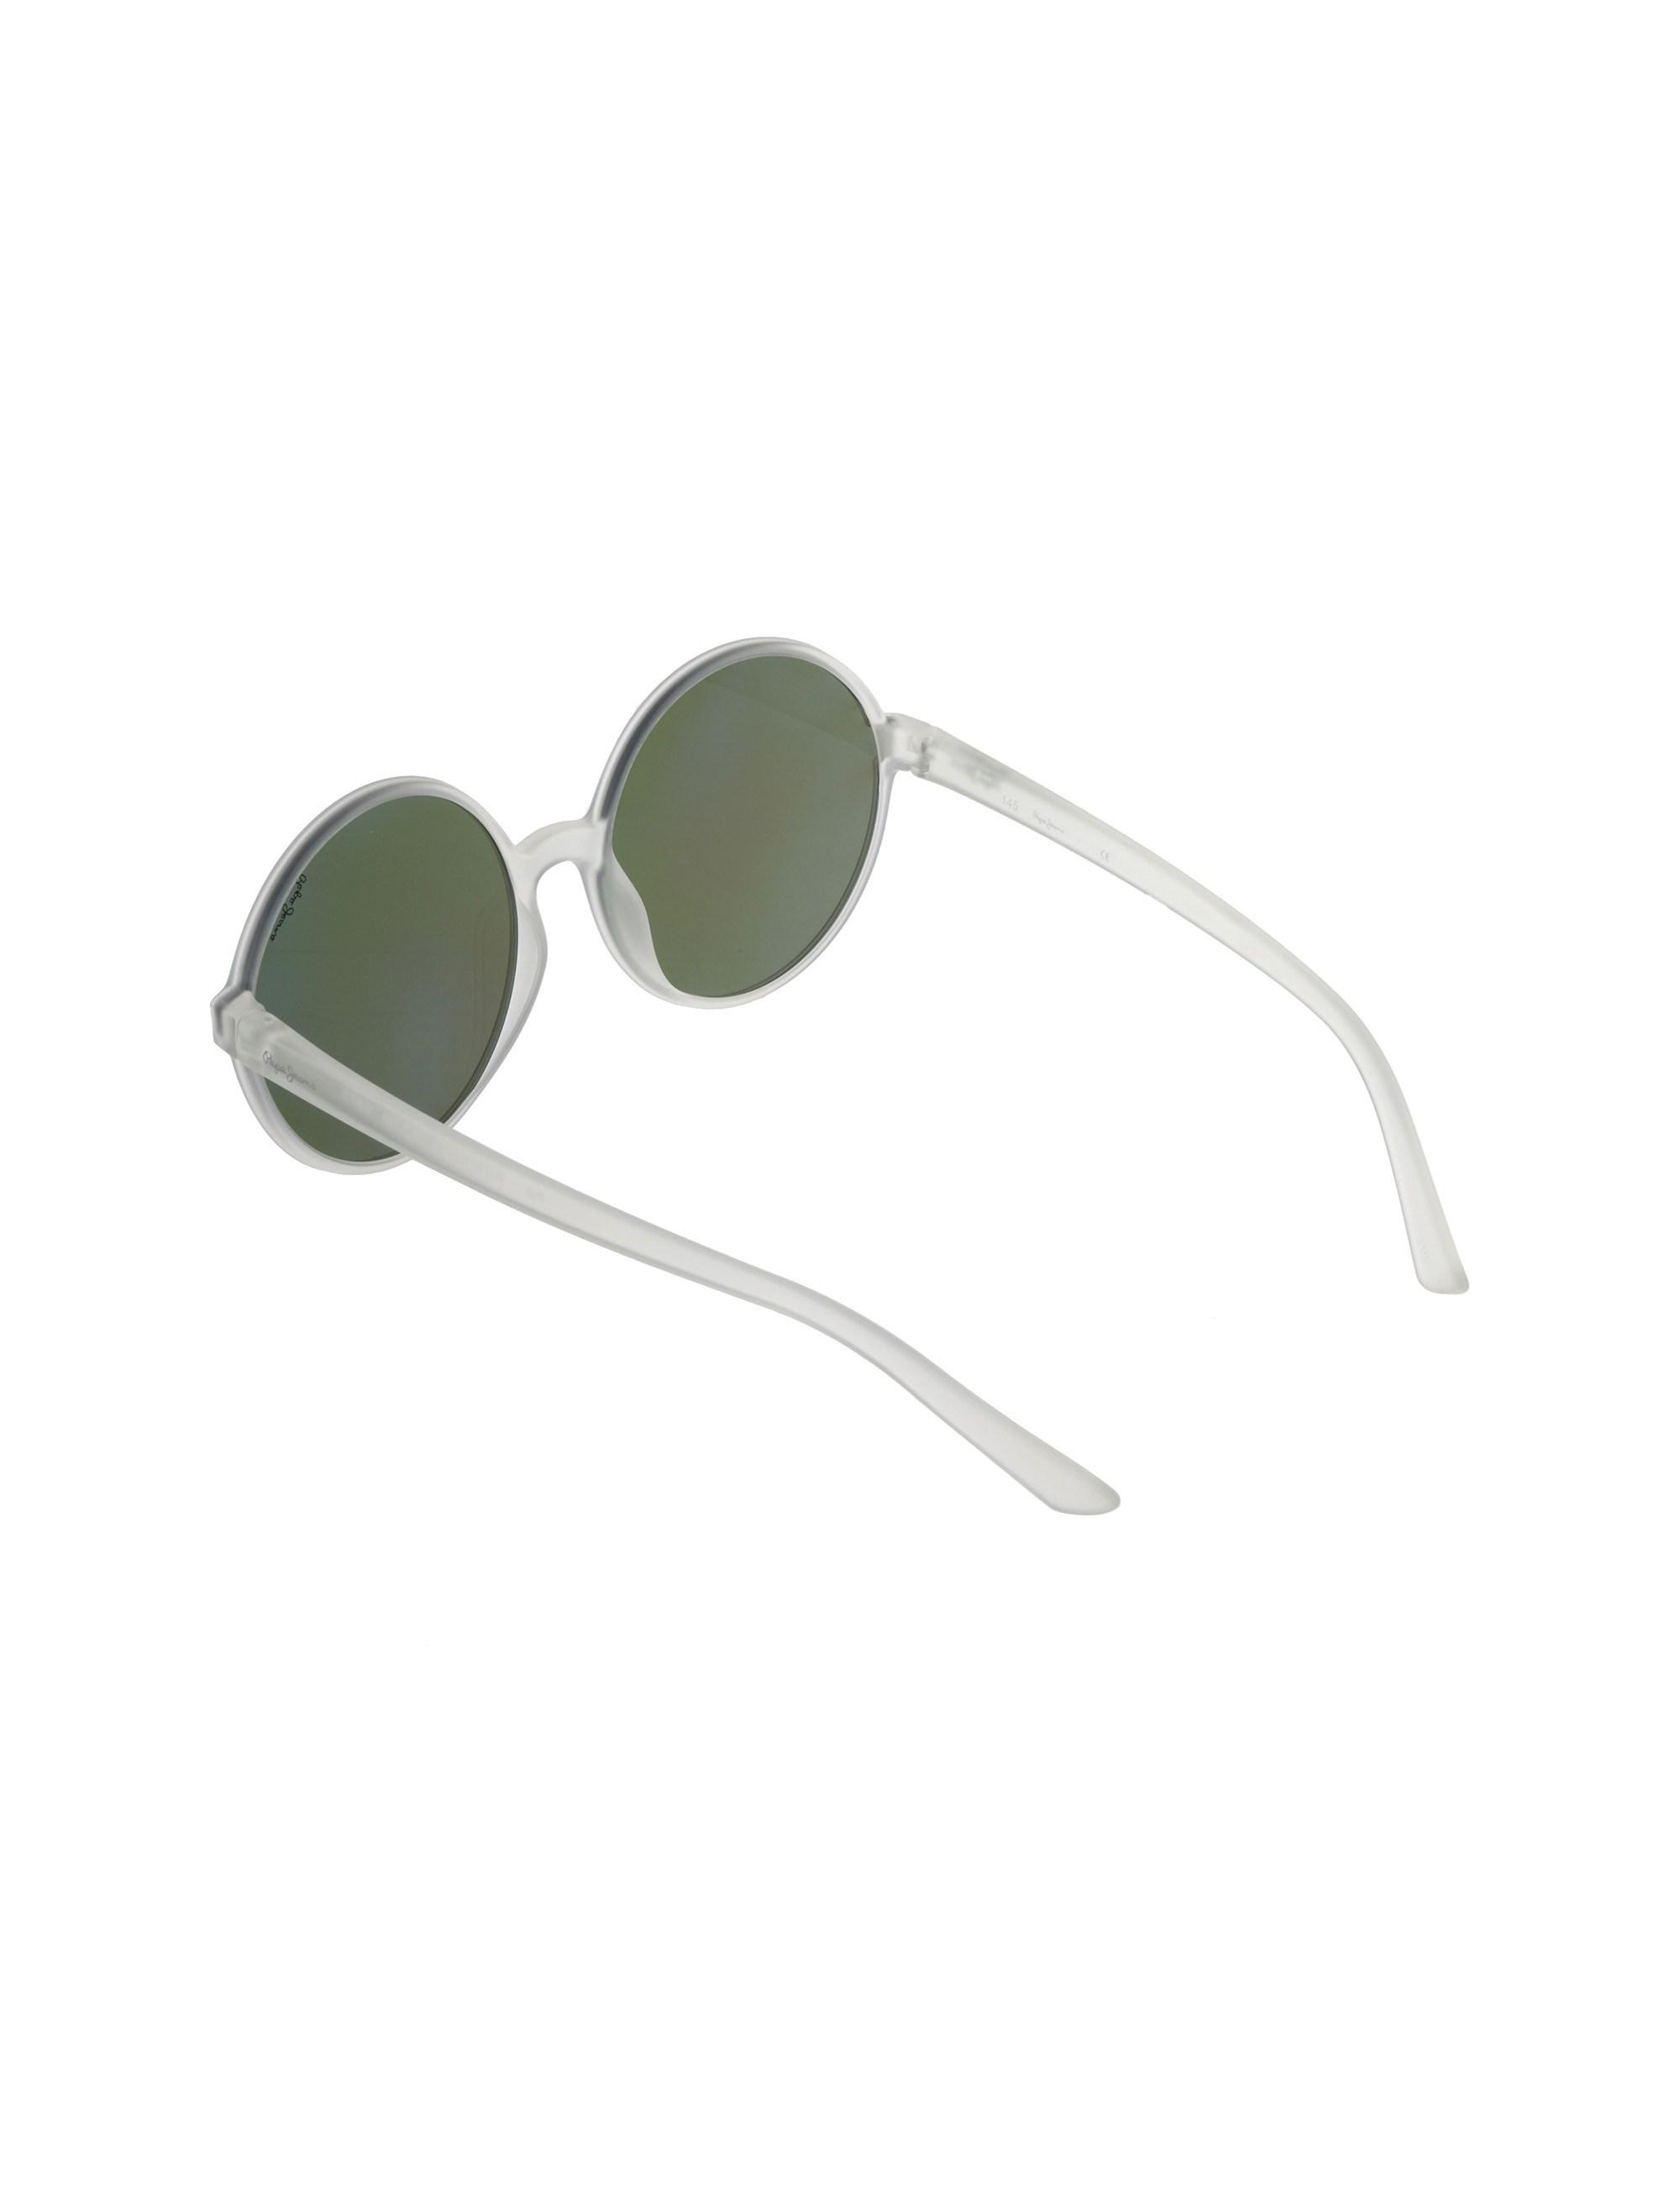 عینک آفتابی گرد زنانه - پپه جینز - شفاف - 4